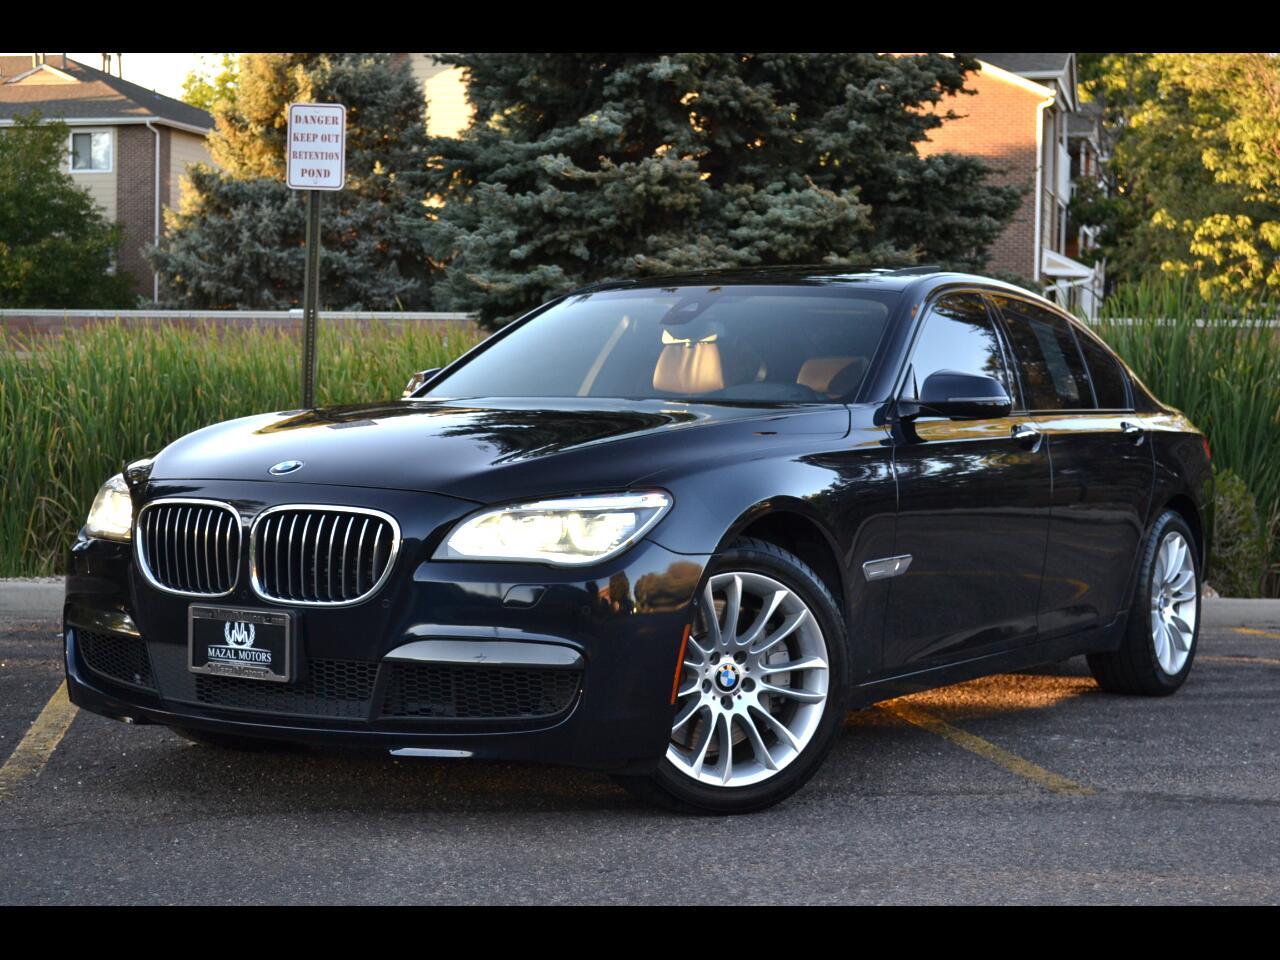 BMW 7 Series 4dr Sdn 750i xDrive AWD 2015